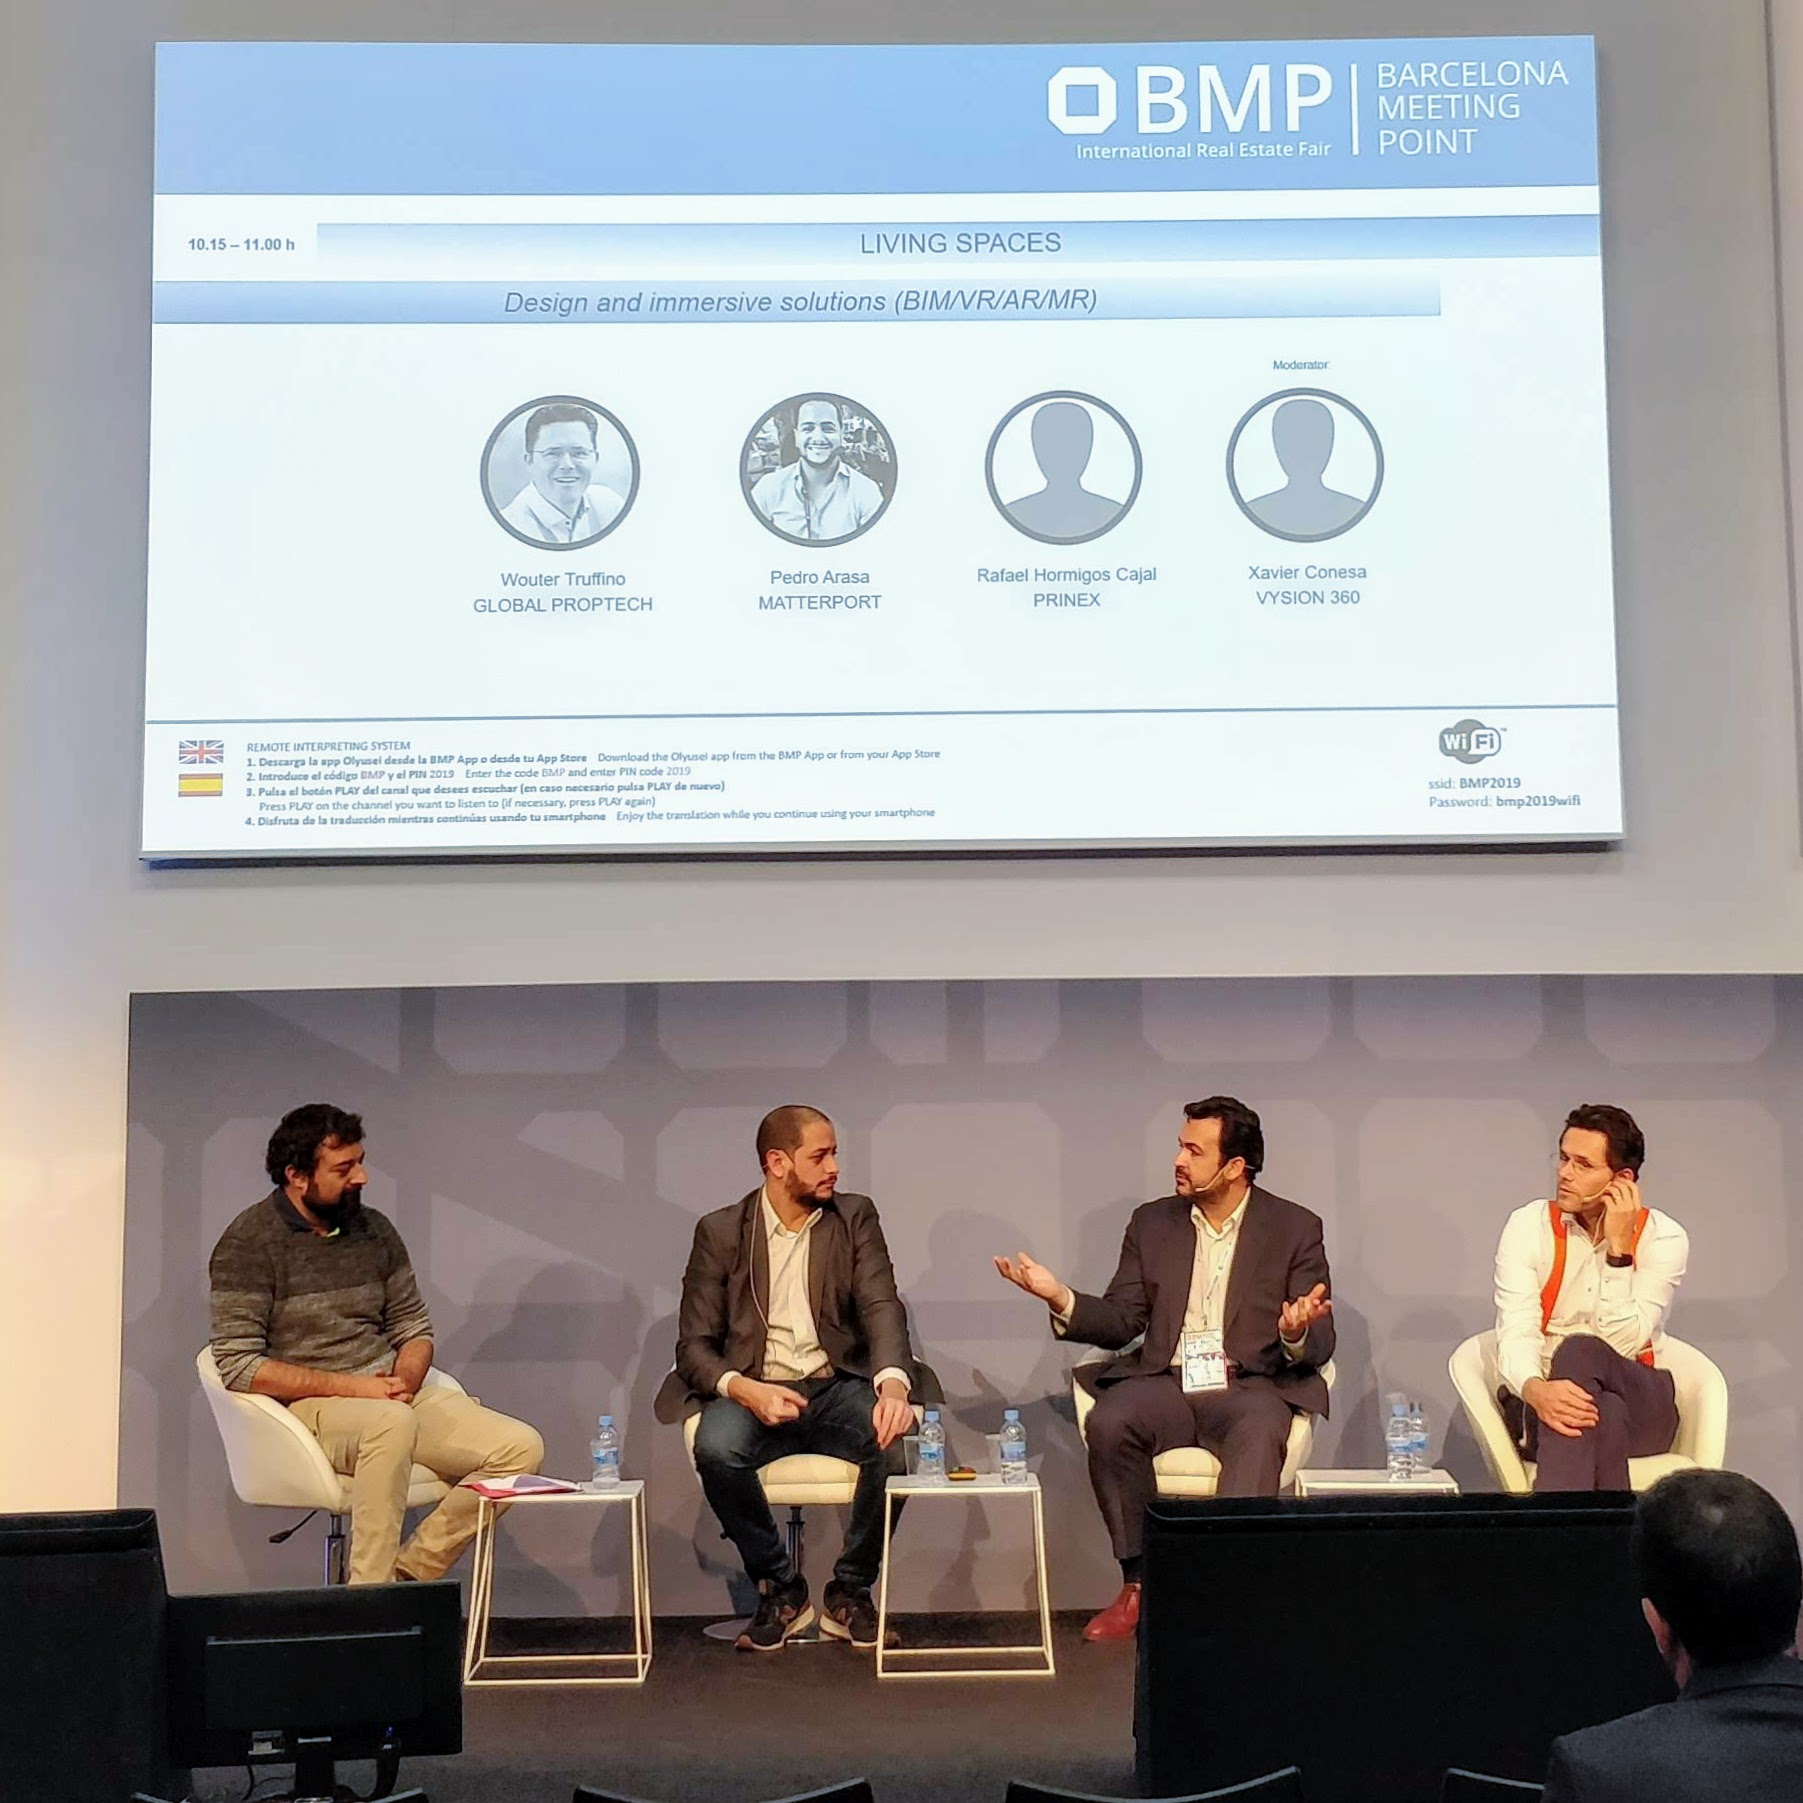 Xavi Conesa; Pedro Arasa; Rafael Hormigos; Woulter Truffino